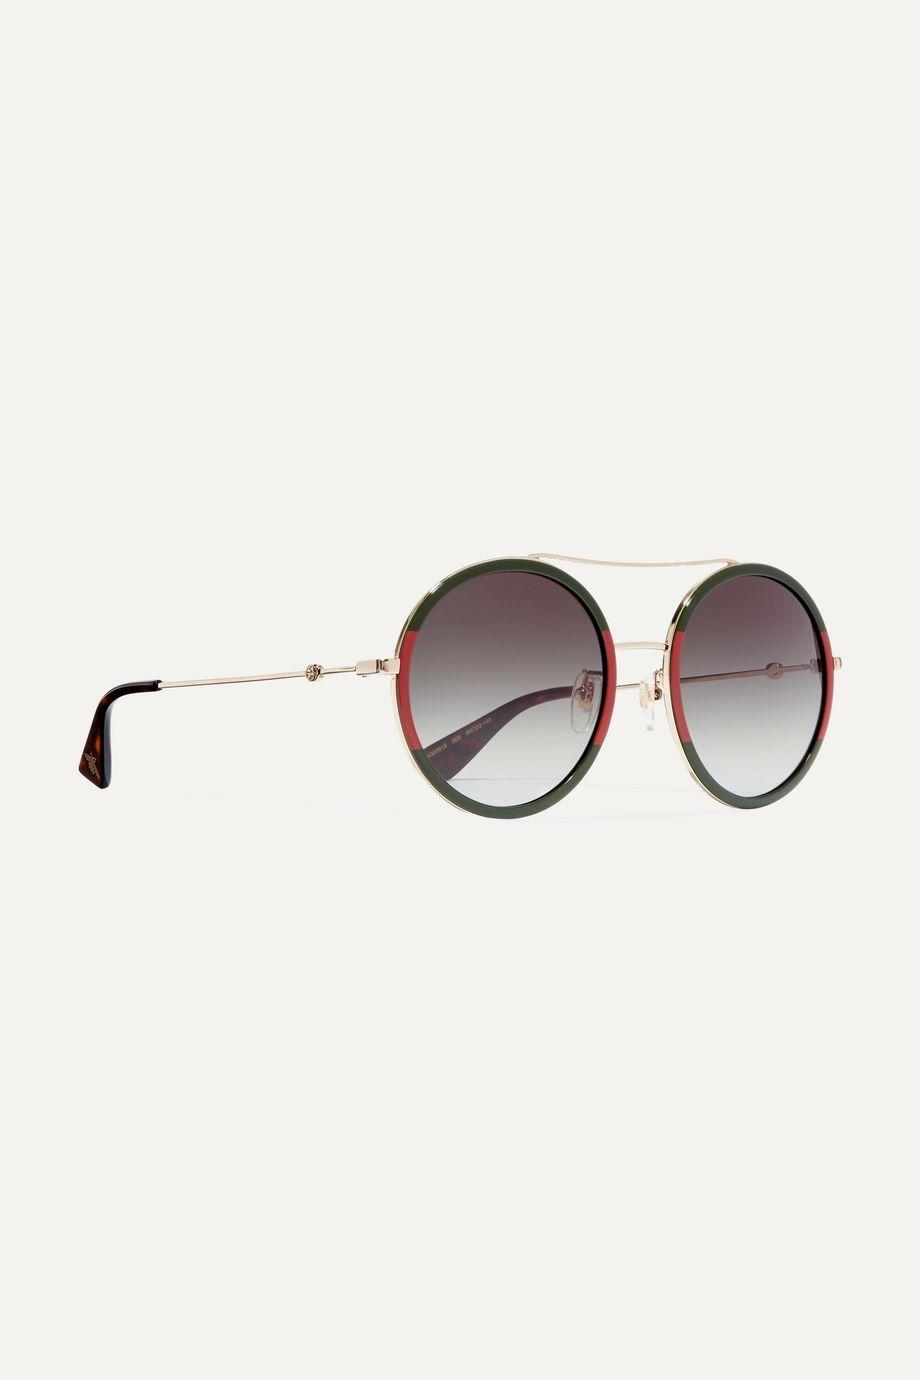 Gucci Round-frame striped acetate and gold-tone sunglasses